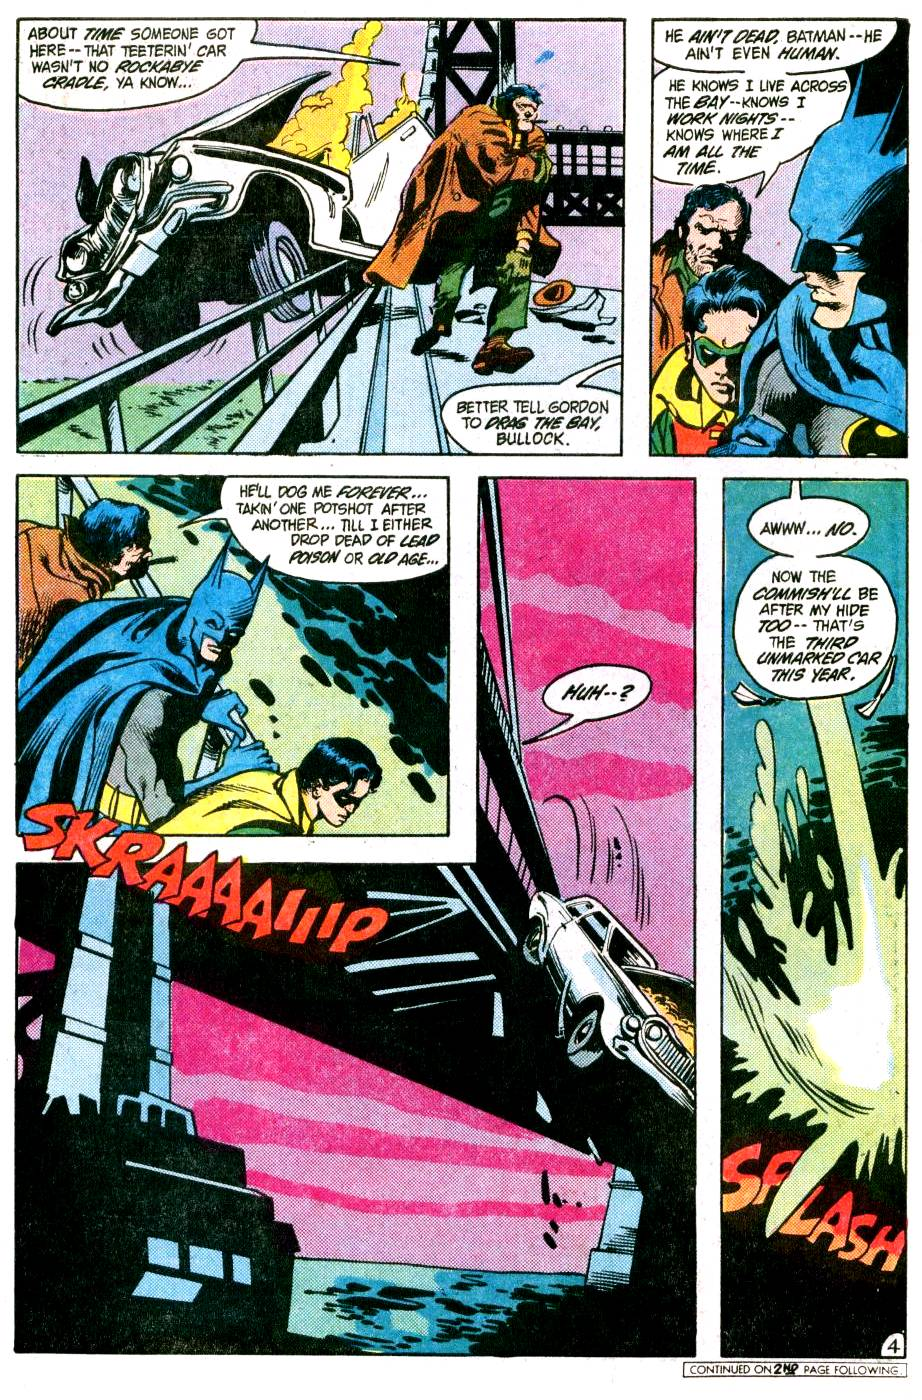 Detective Comics (1937) 542 Page 4